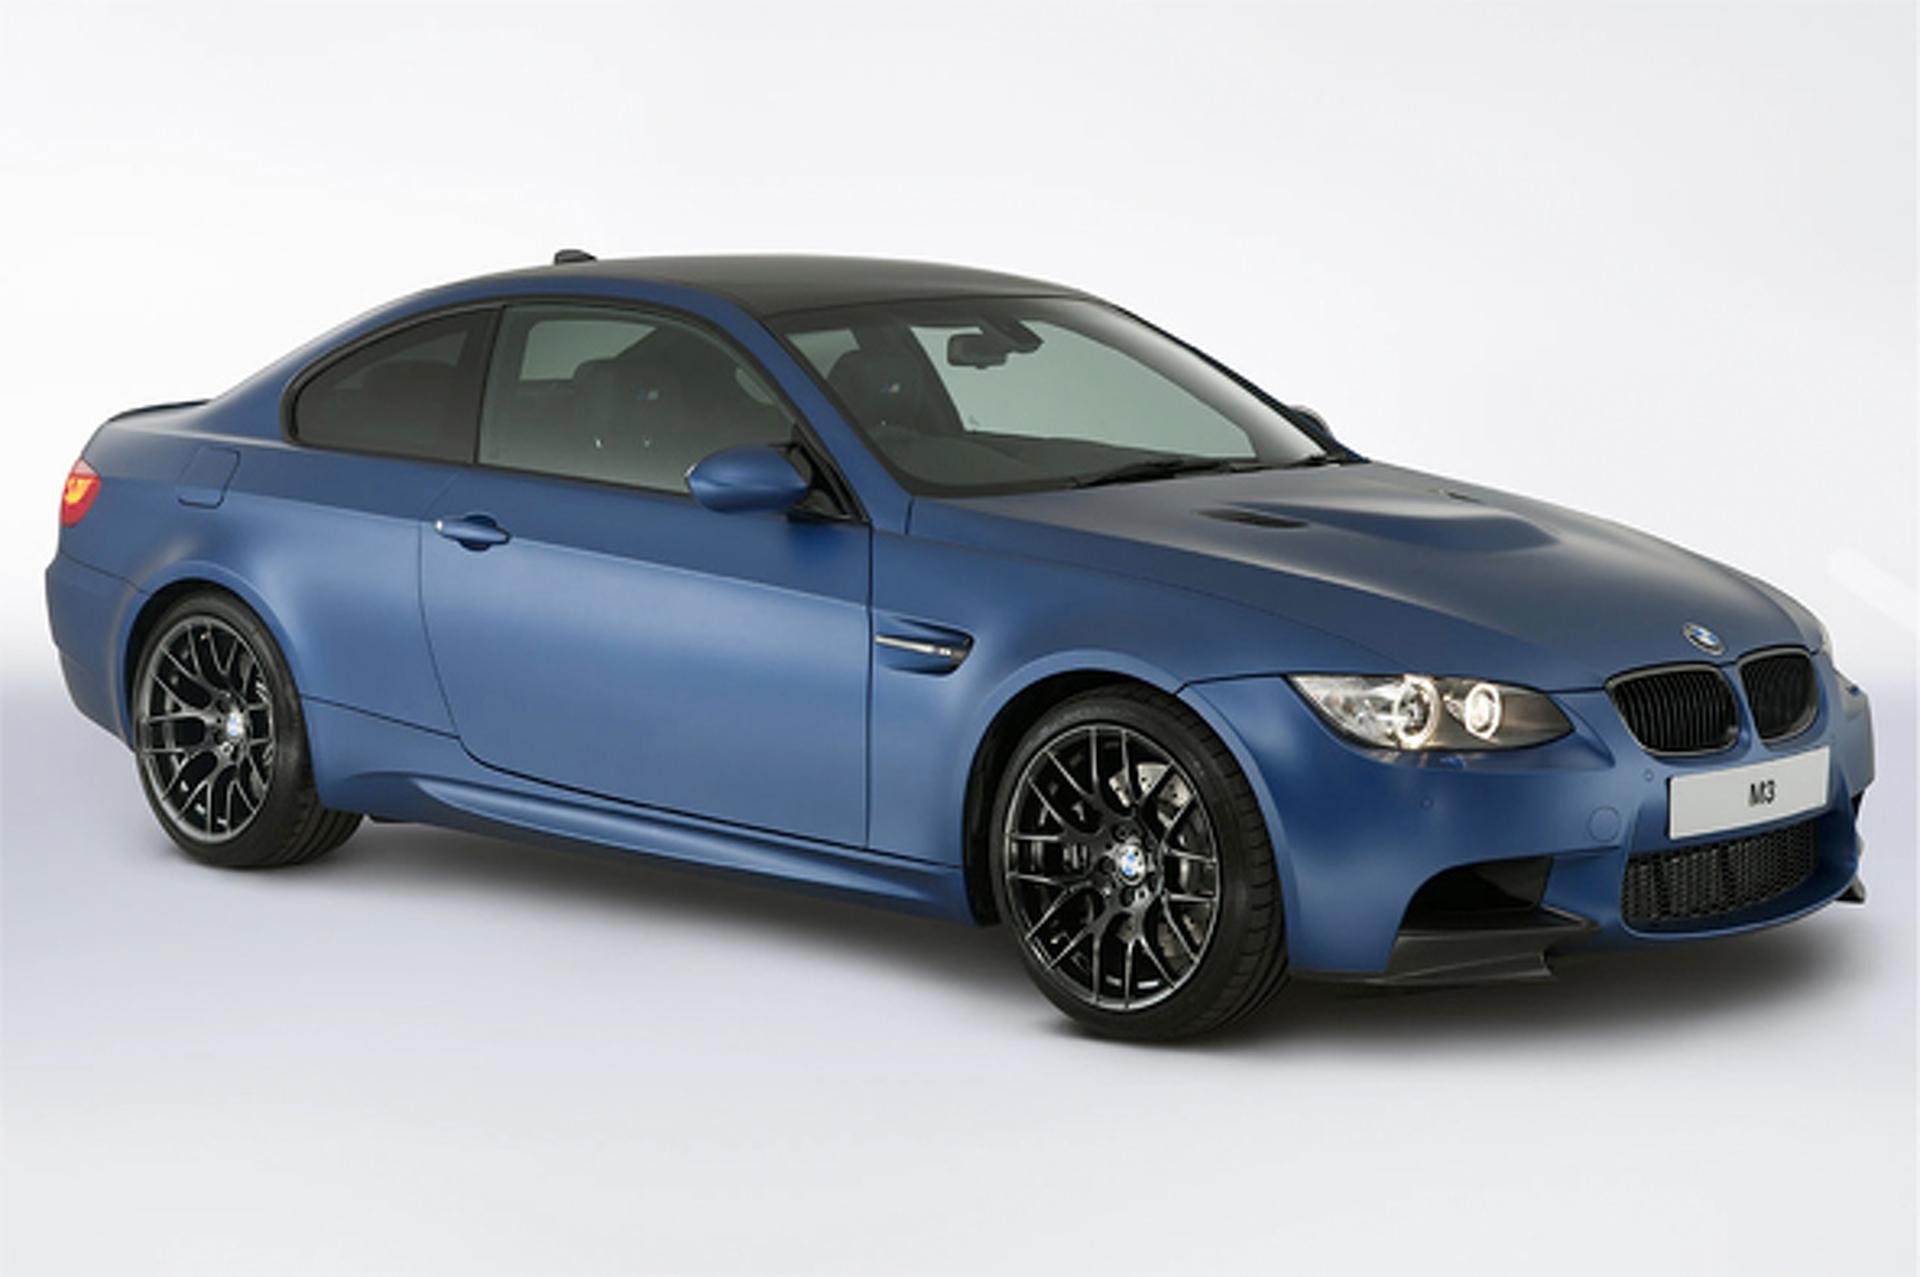 Unveiled: BMW M3 M Performance Edition